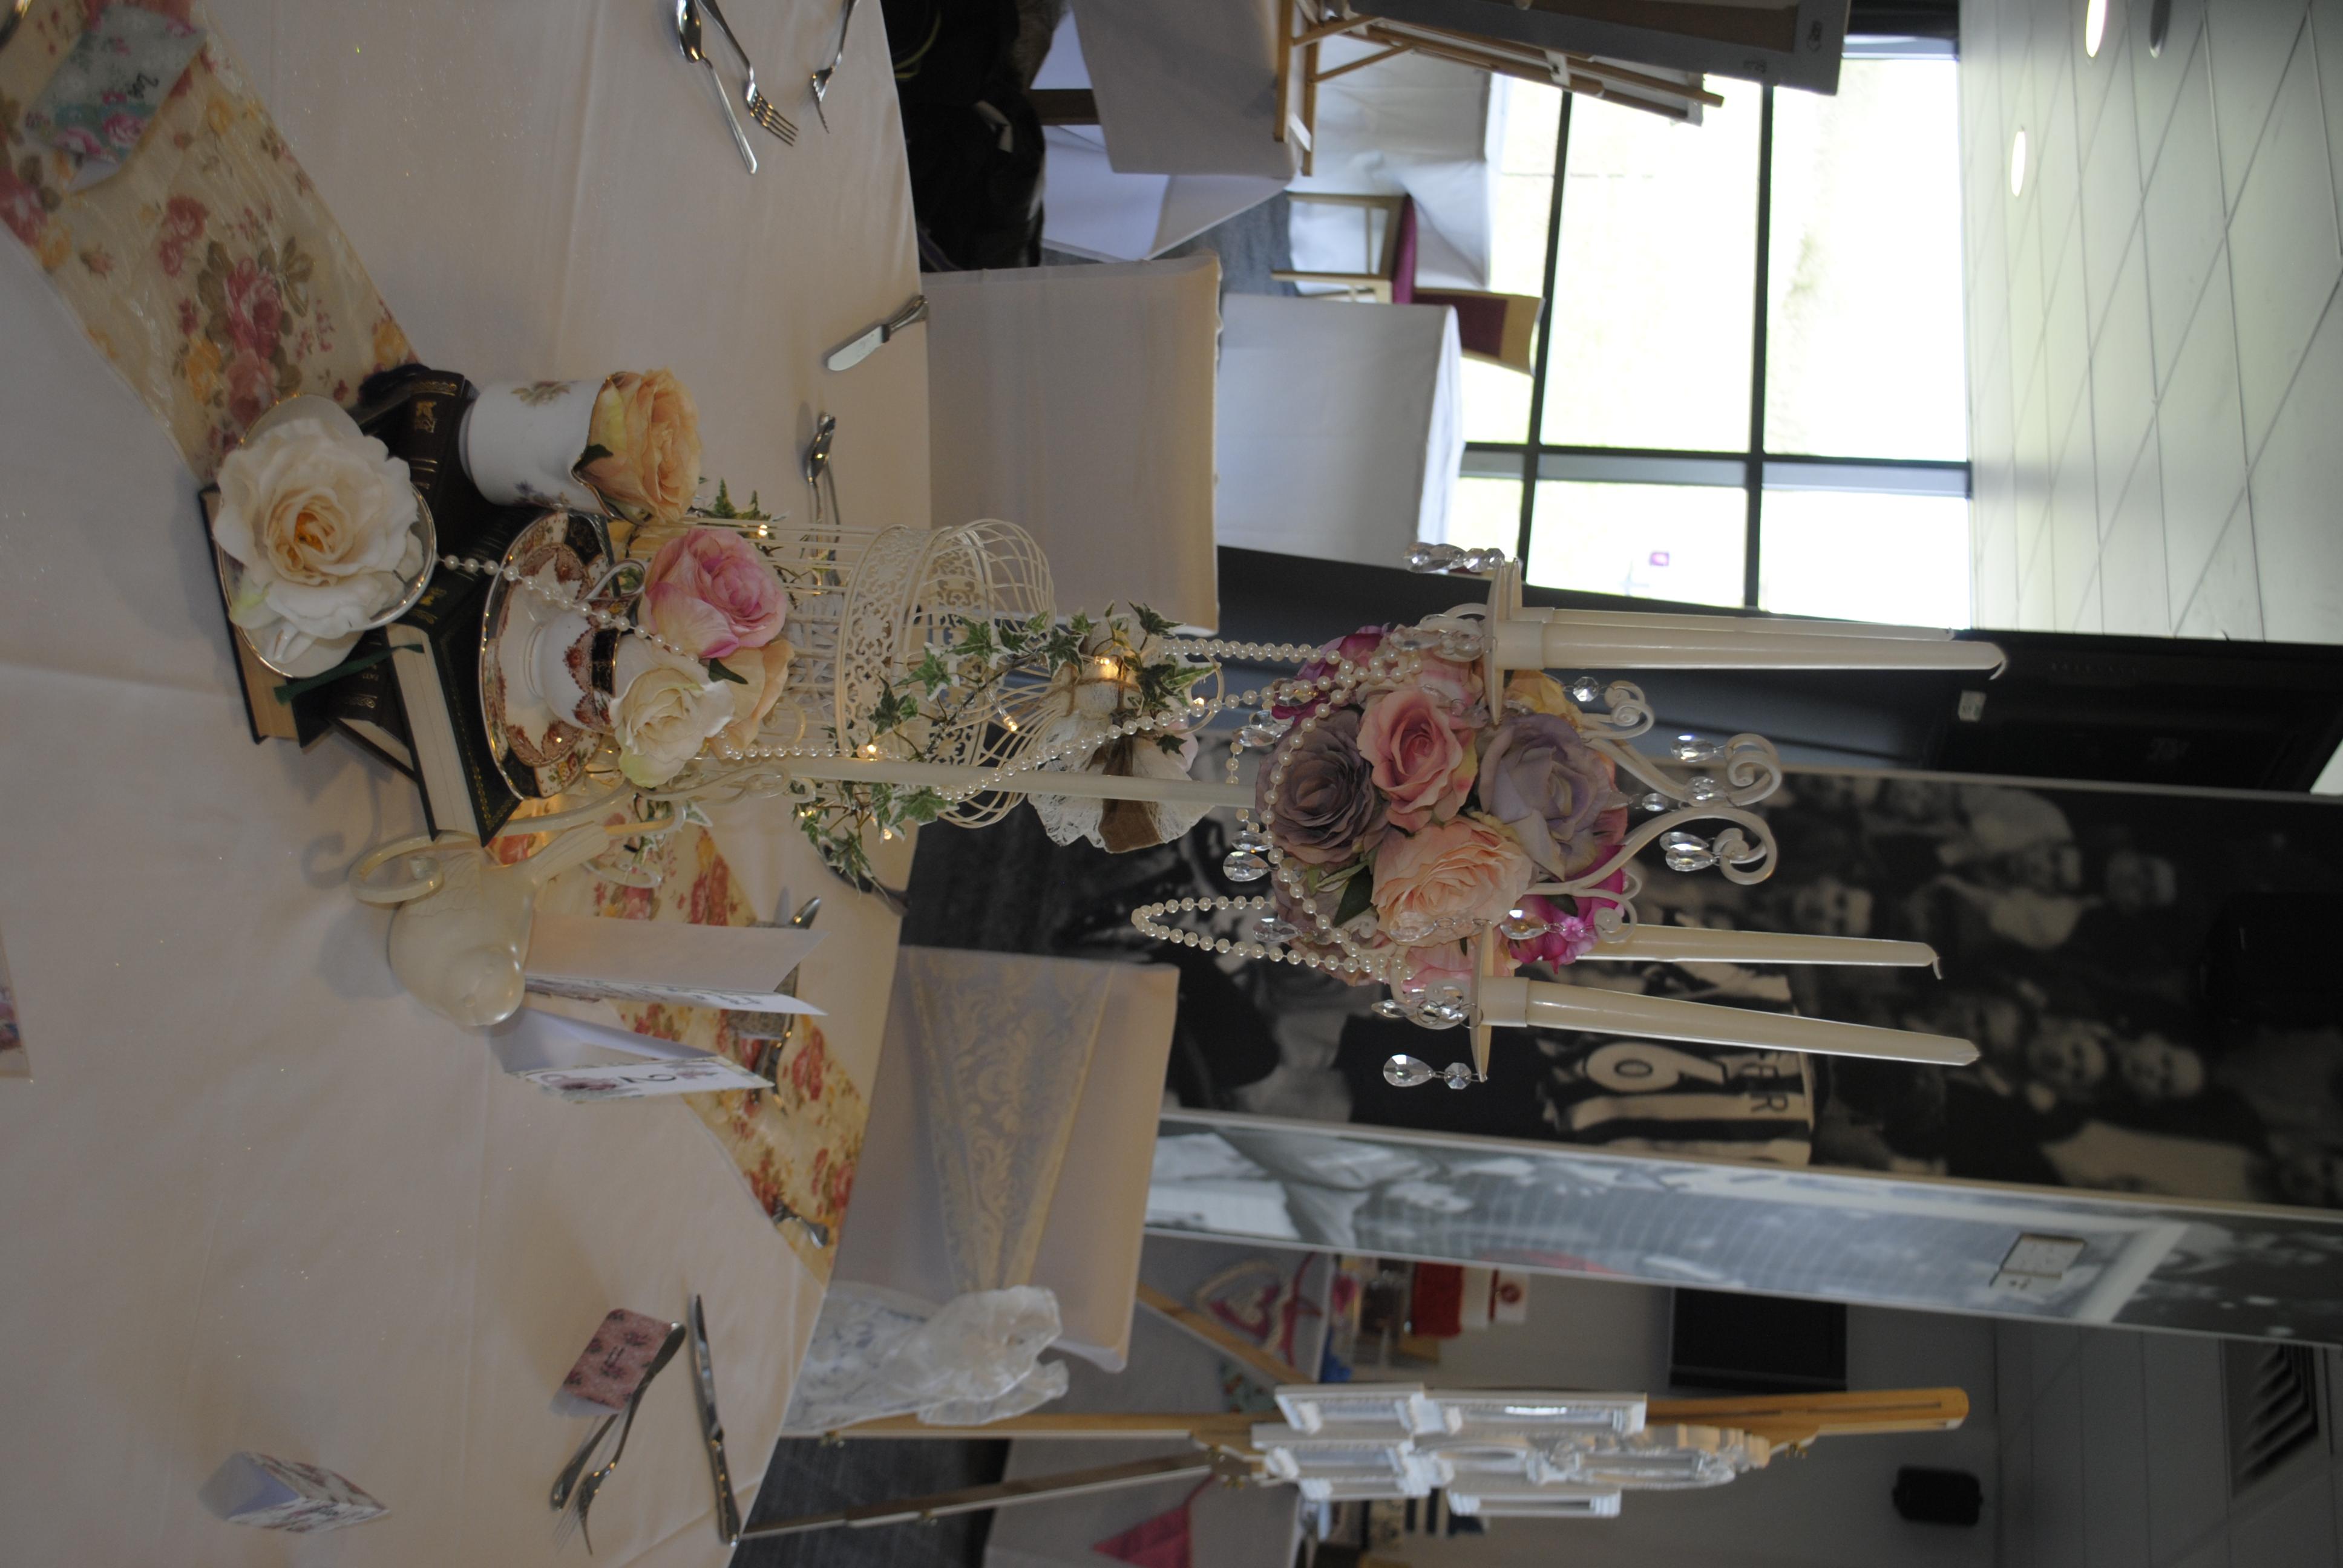 Cream Candelabra, birdcage and teacups